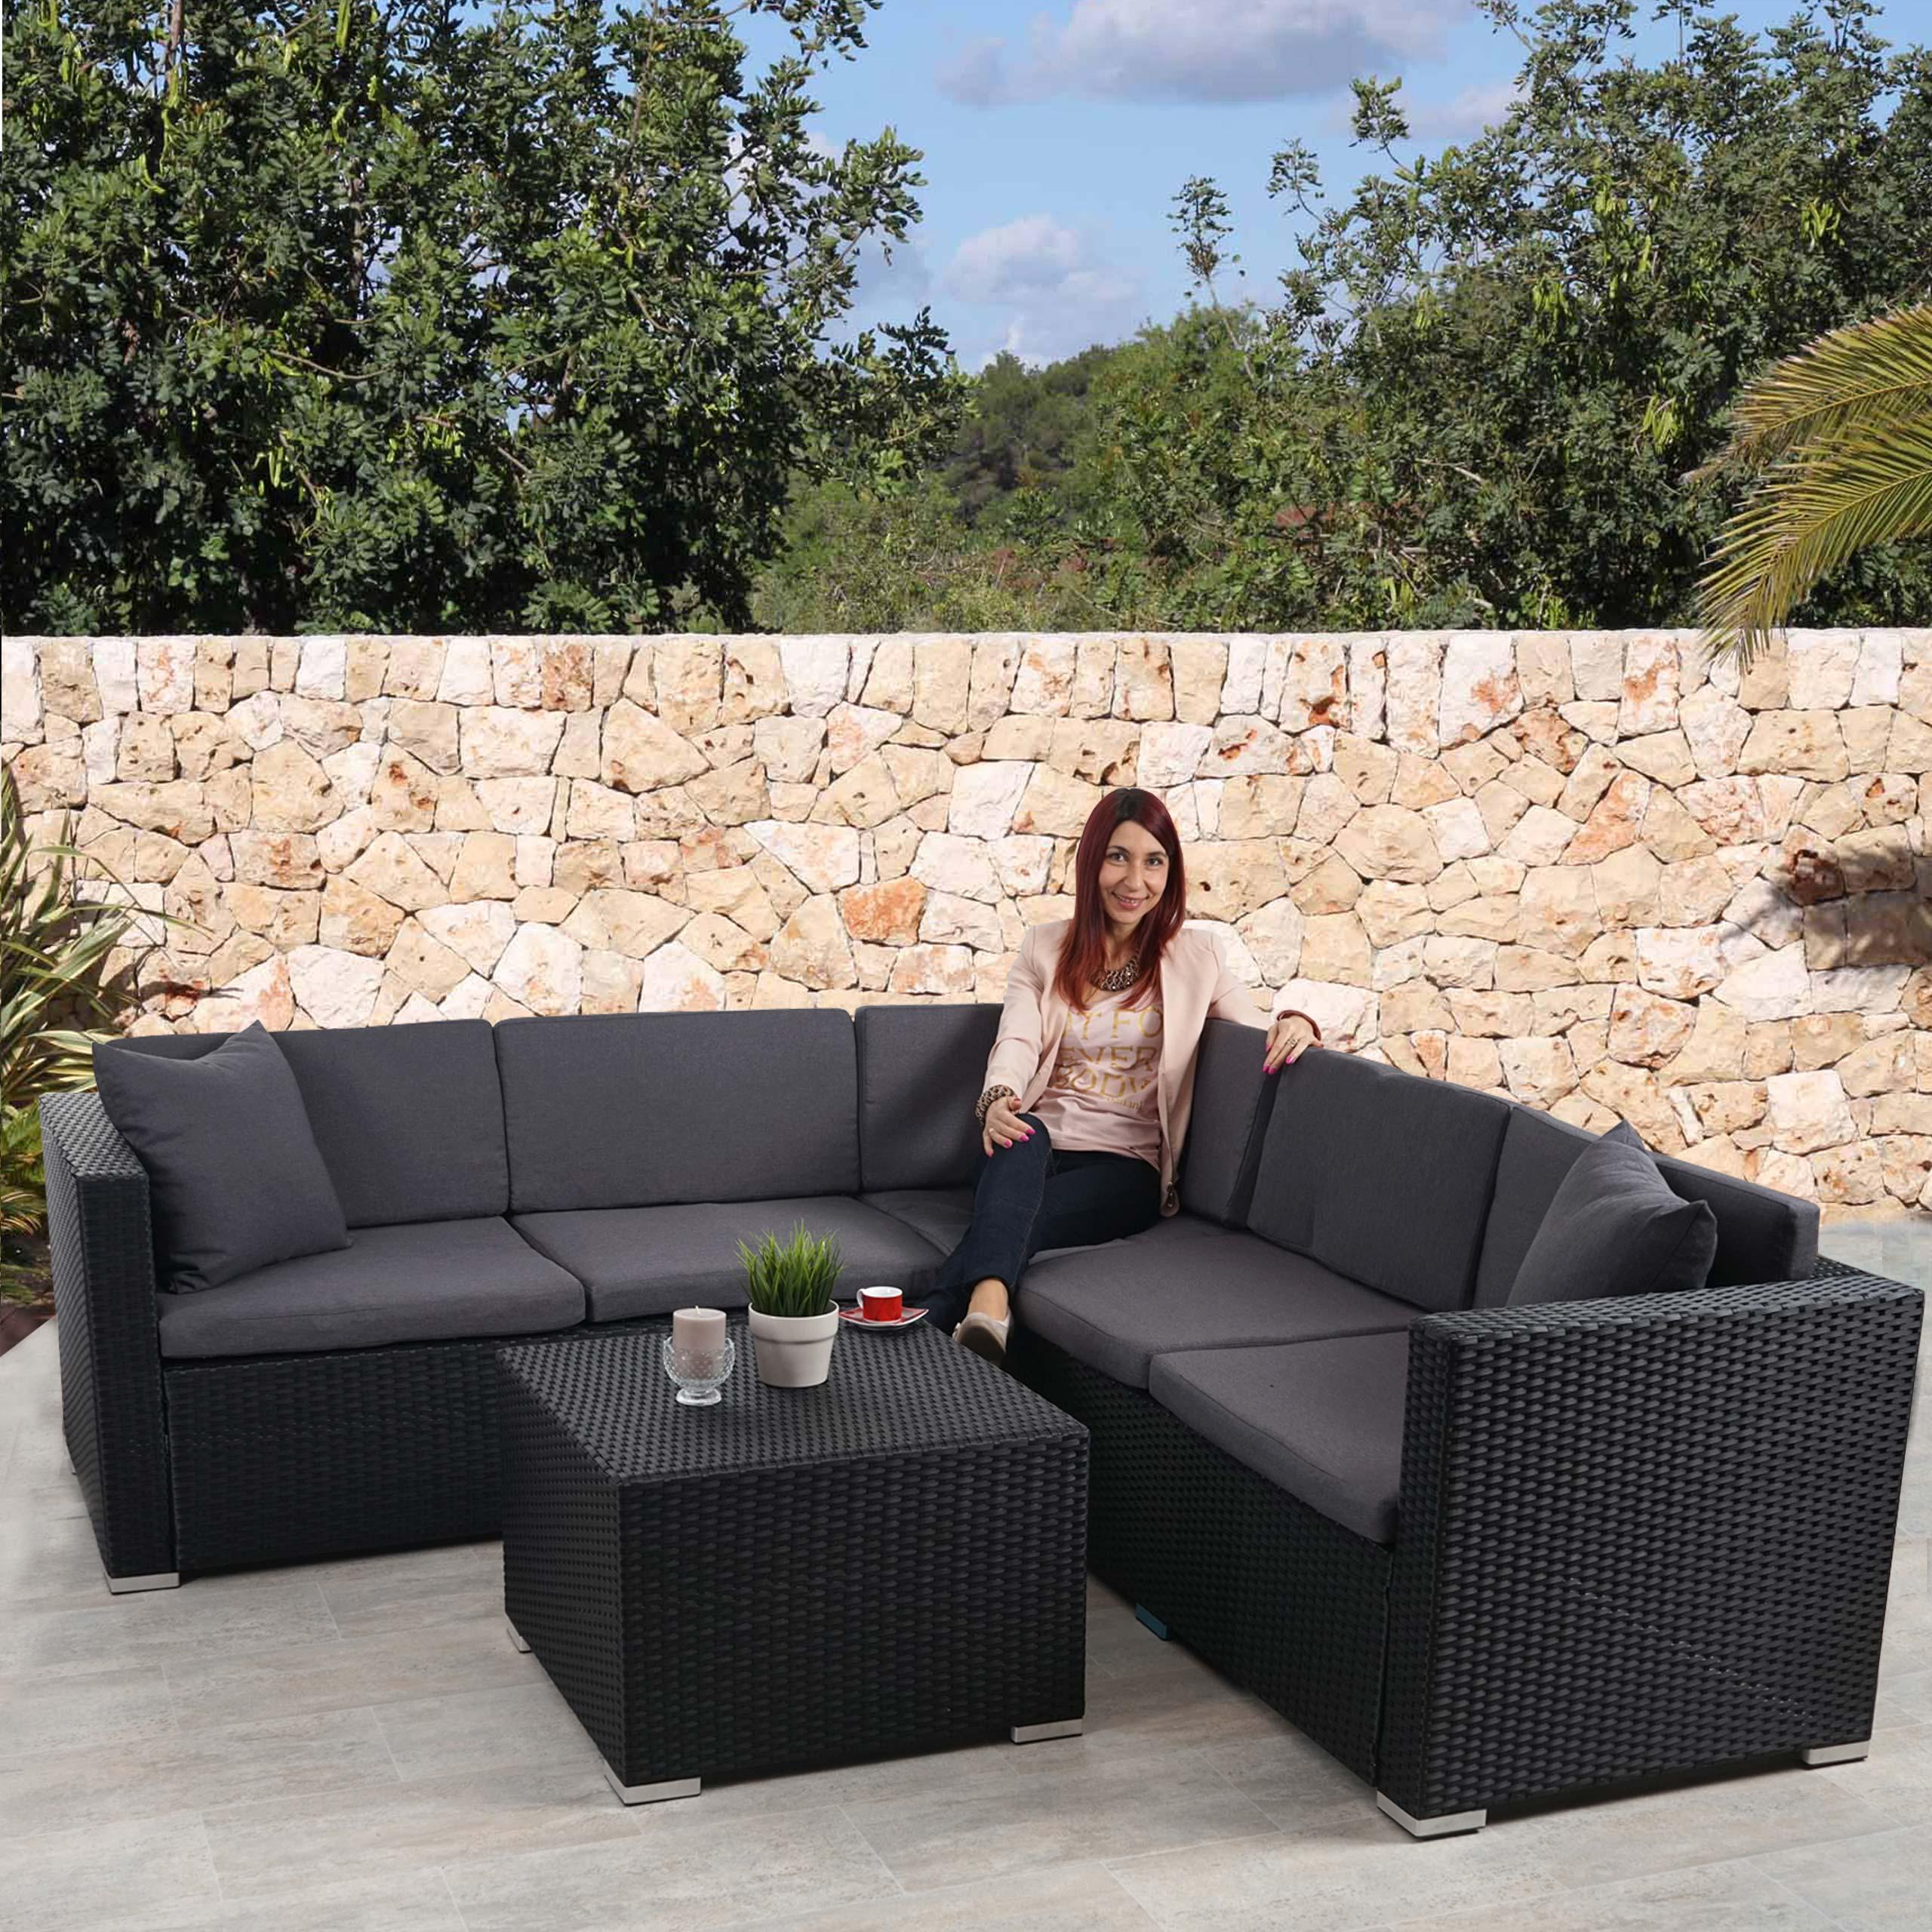 poly rattan sofa garnitur rom basic sitzgruppe lounge set alu anthrazit kissen anthrazit. Black Bedroom Furniture Sets. Home Design Ideas